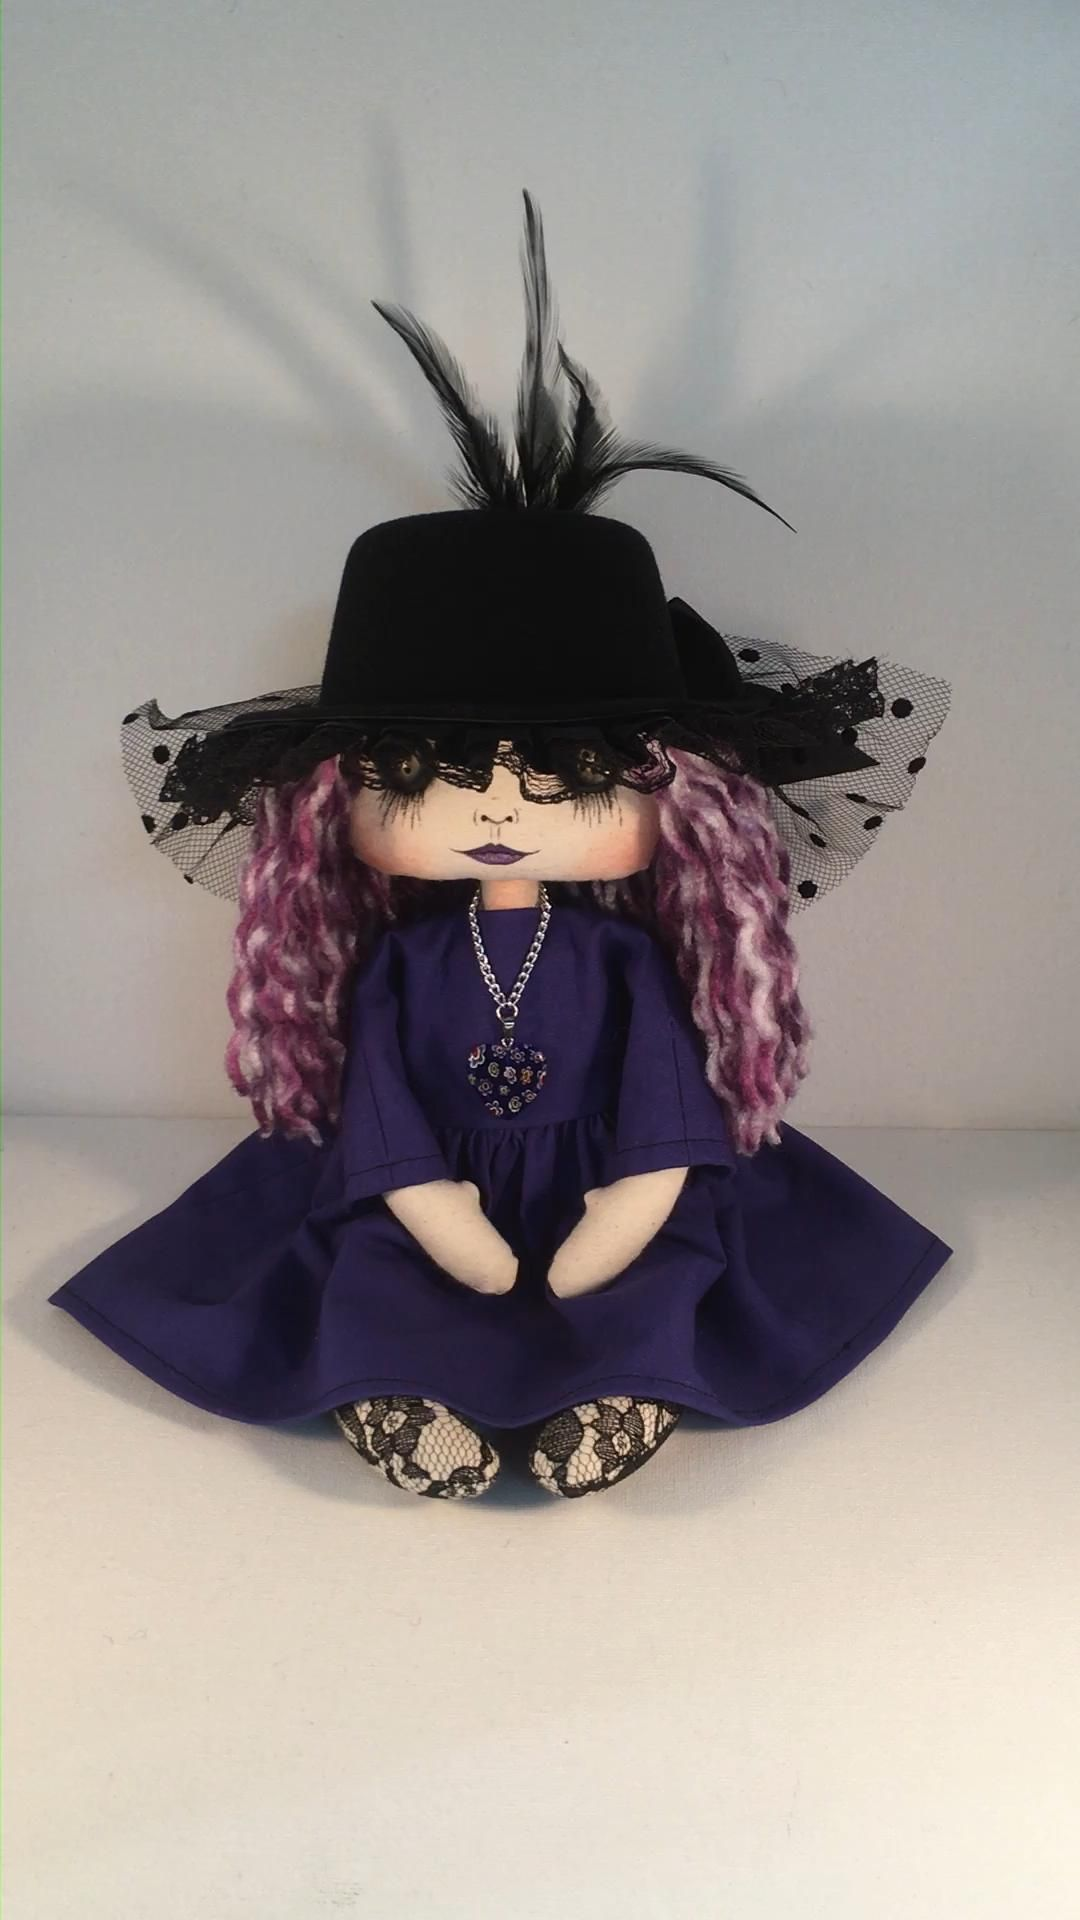 Photo of Gothic art cloth decorative doll